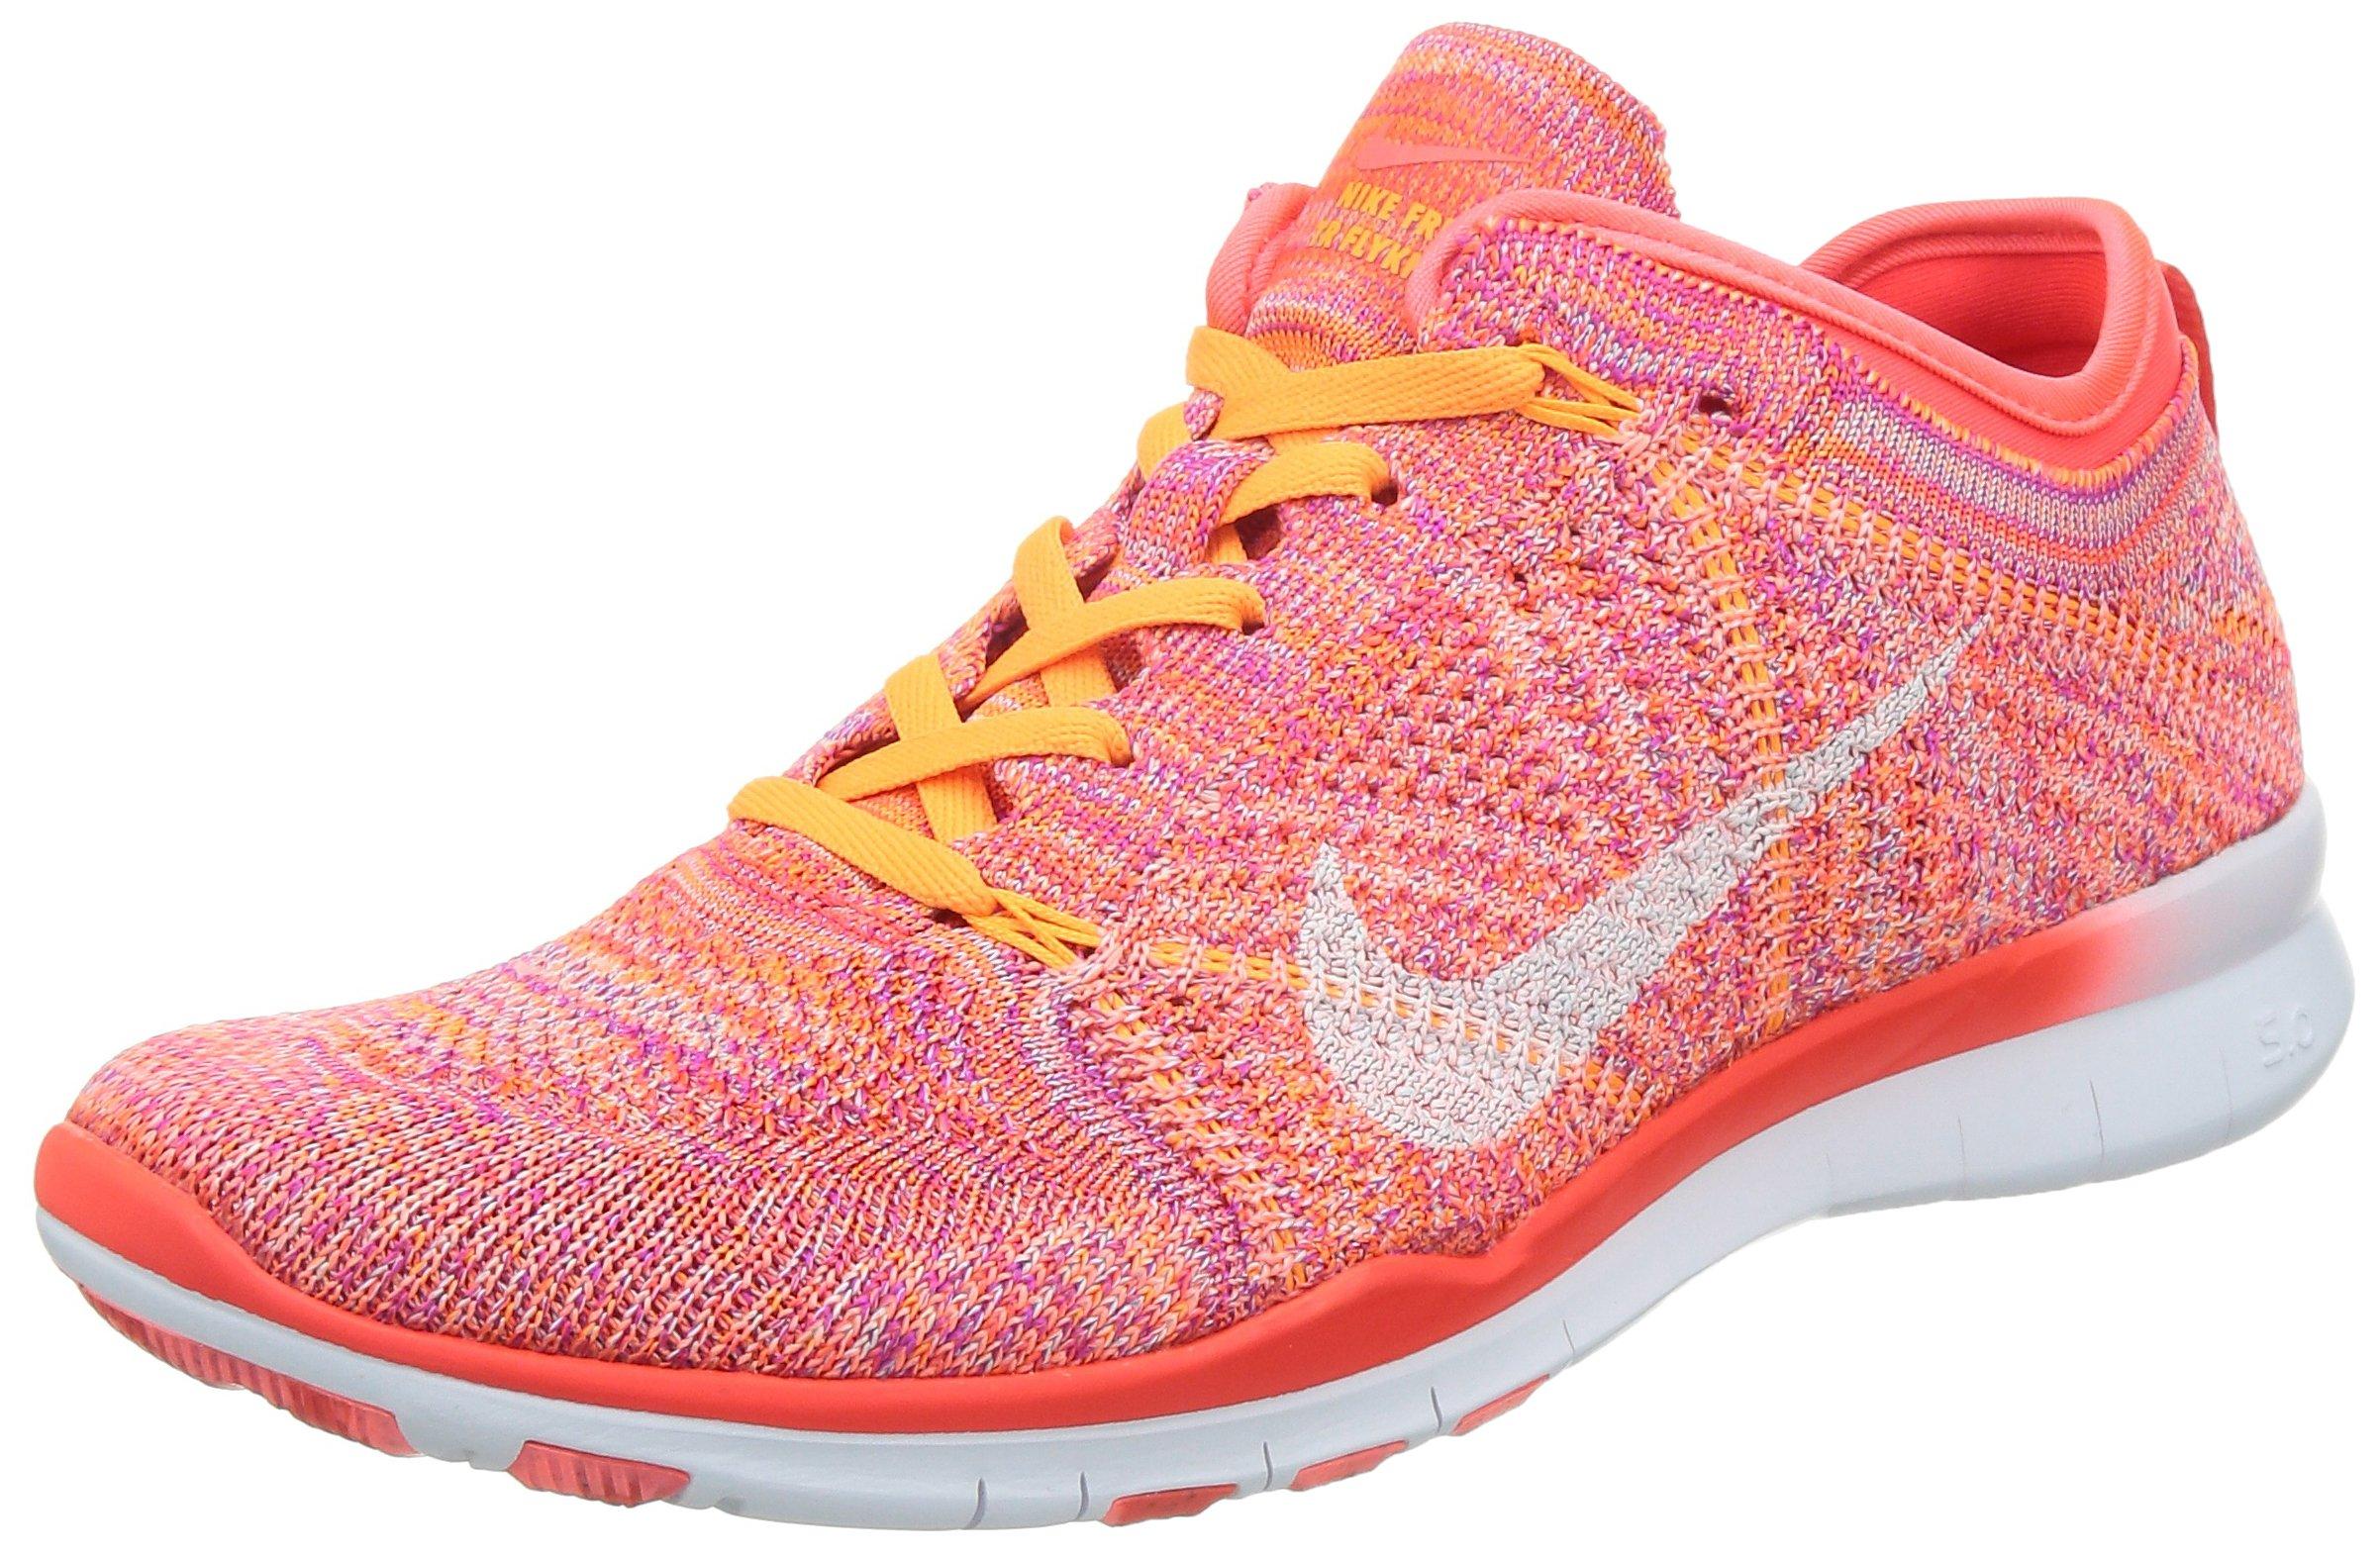 Nike Women's Wmns Free TR Flyknit, BRIGHT CRIMSON/WHITE-BRIGHT CITRUS-T, 7.5 US